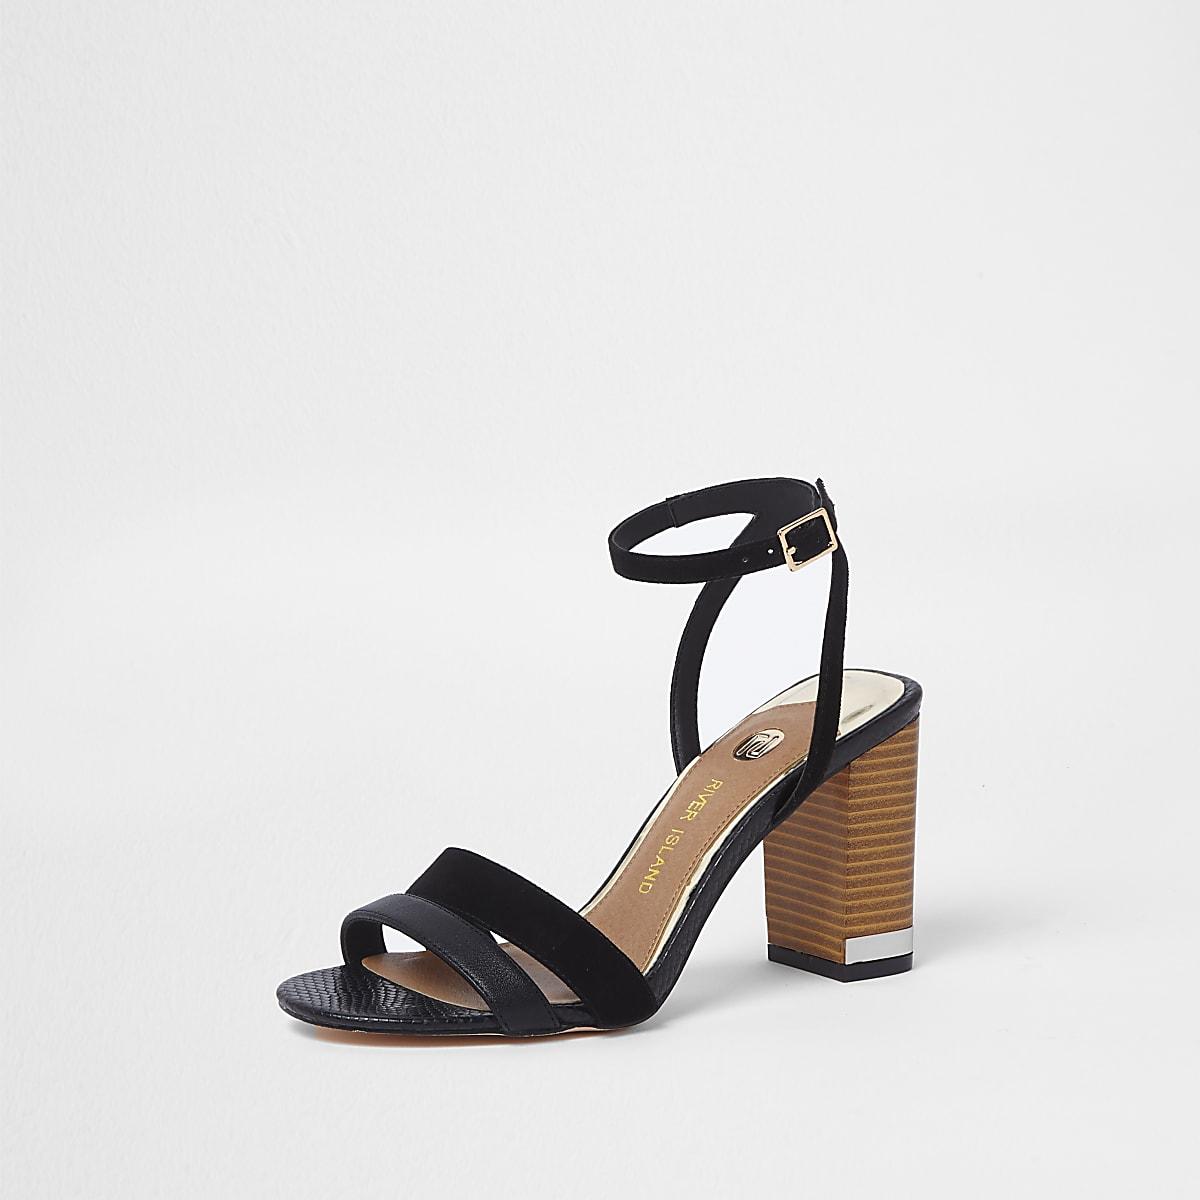 f327f6d88ed Black block heel sandals - Sandals - Shoes   Boots - women